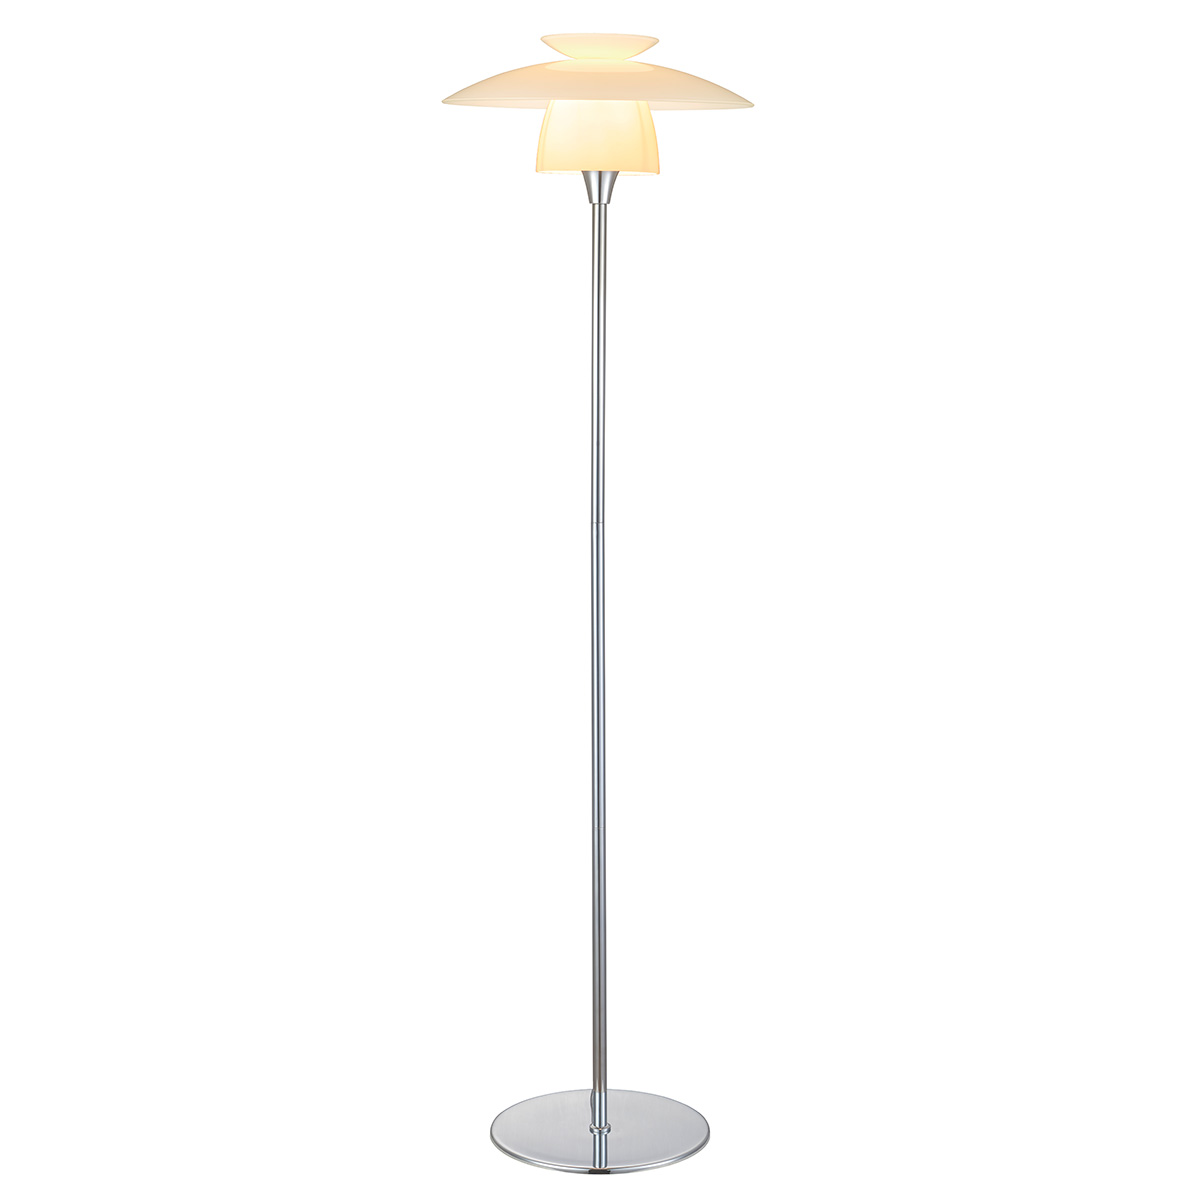 Halo Design gulvlampe - Scandinavia